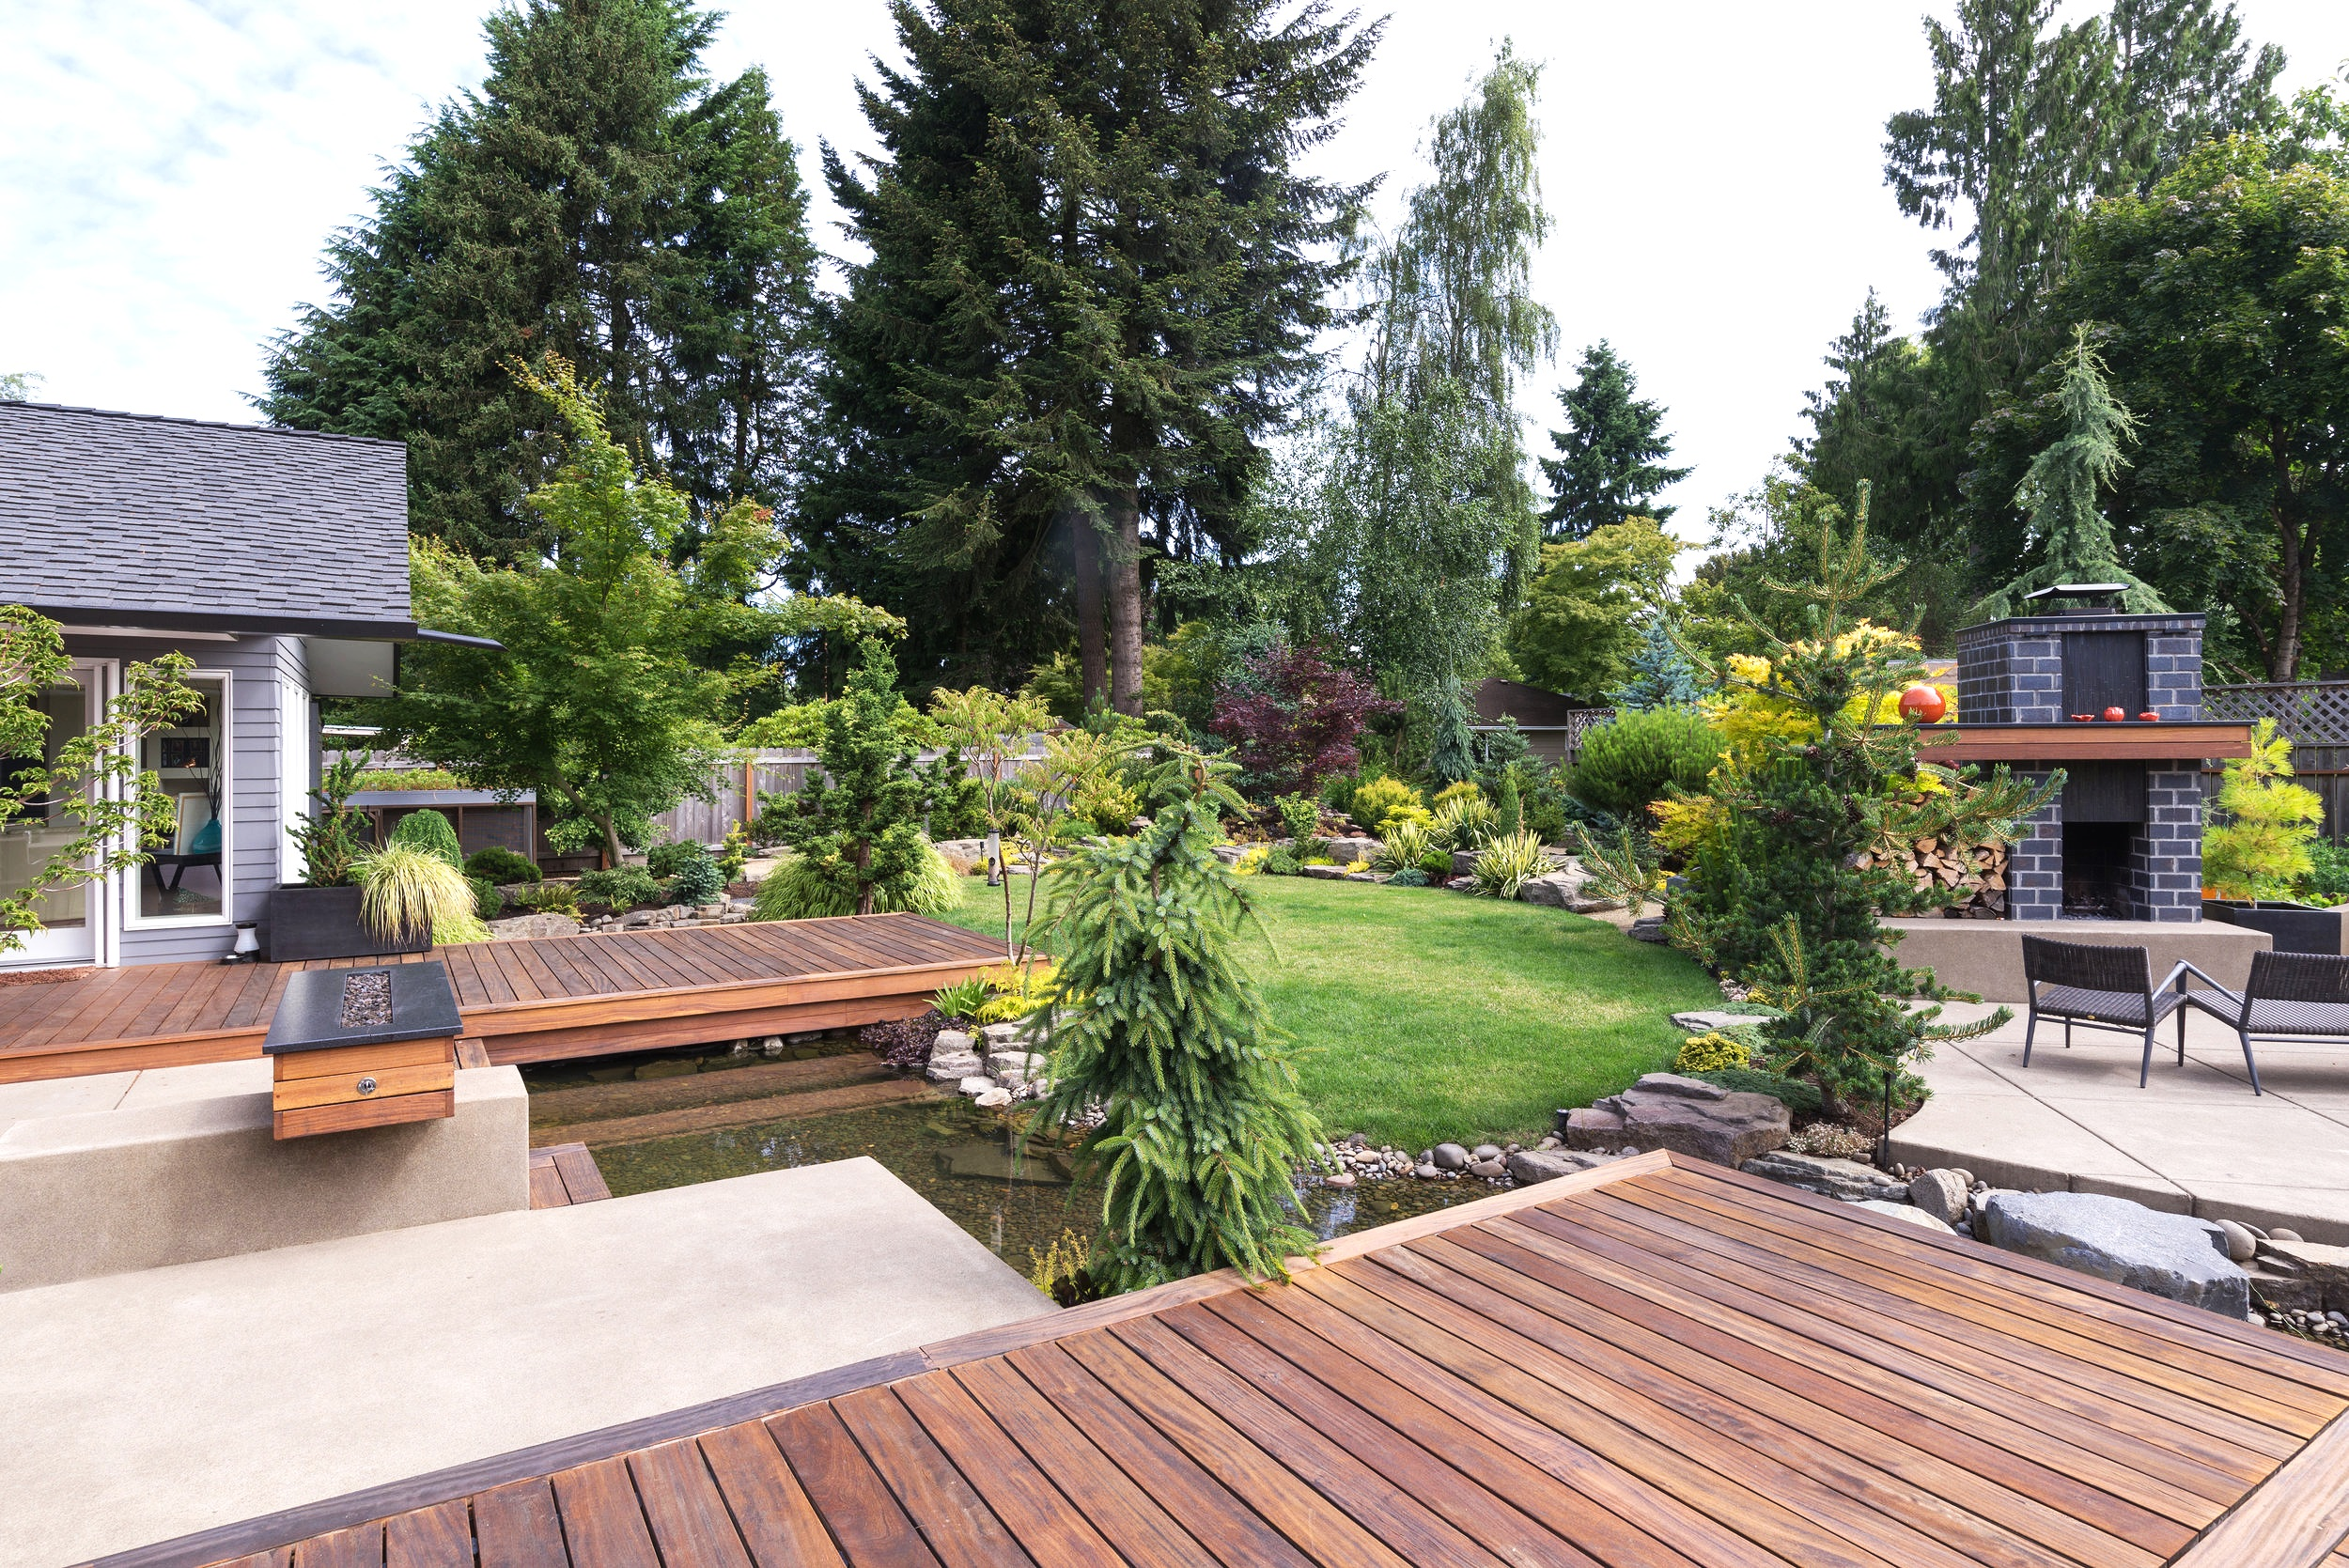 london-ontario-best-landscaper-design-landscaping-patio-driveway-deck-hunter-home-garden-14.jpg